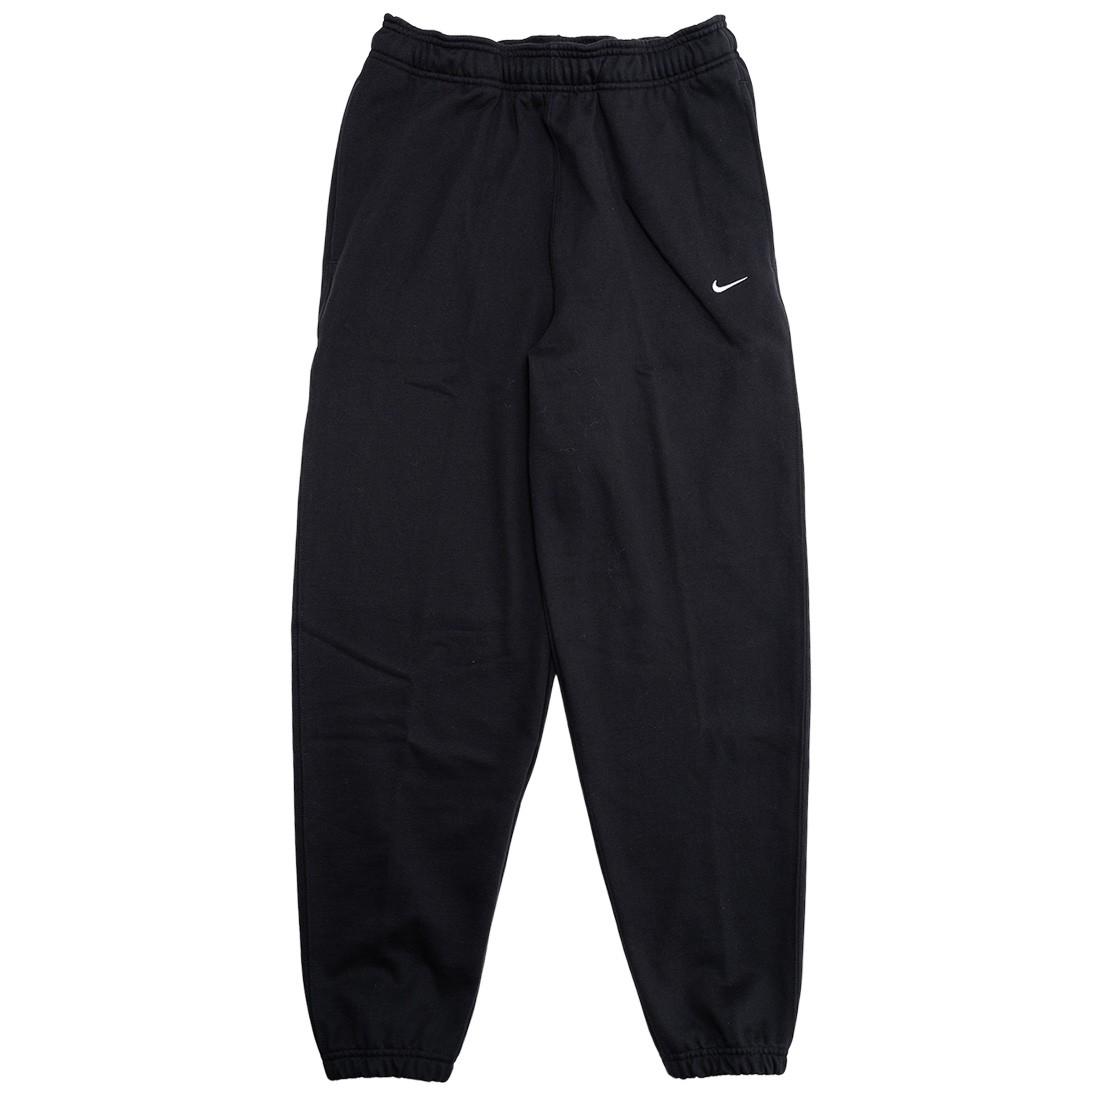 Nike Men Made In The Usa Fleece Pants (black / white)